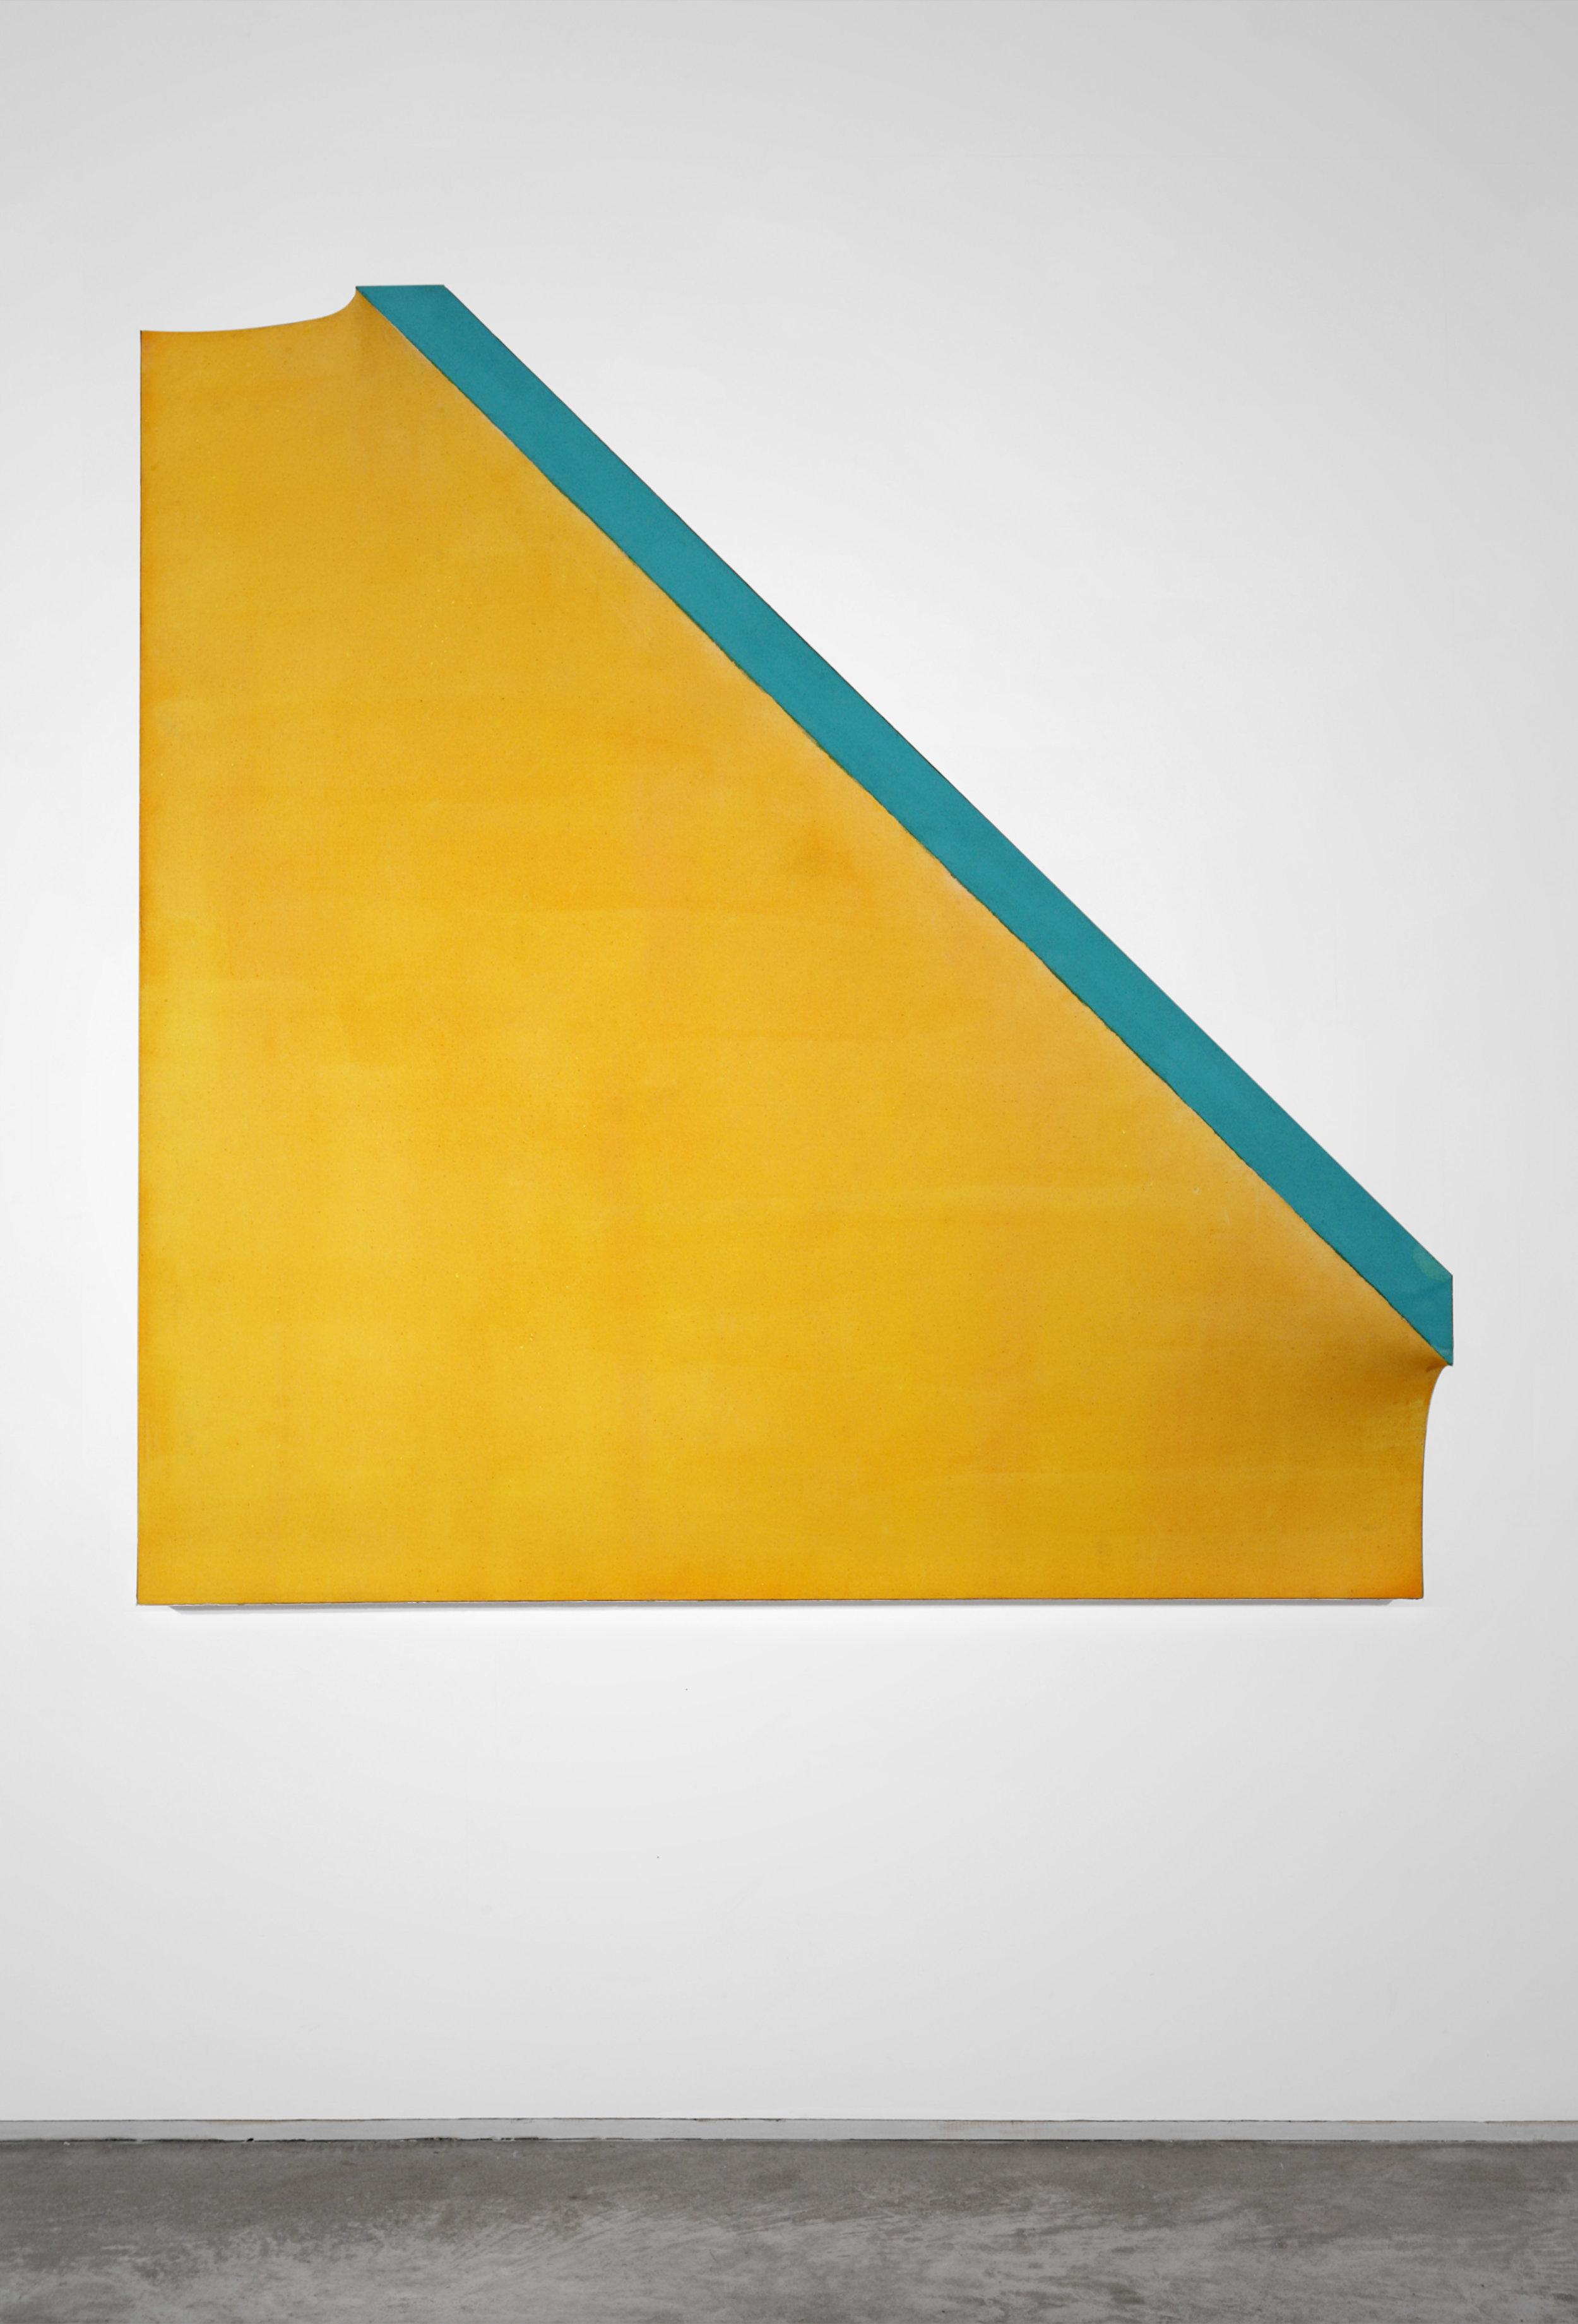 Richard Smith (1931–2016),   A Whole Year a half a day XI , 1966, acrylic on canvas, 48 x 48 x 12 in. (121.9 x 121.9 x 30.5 cm)